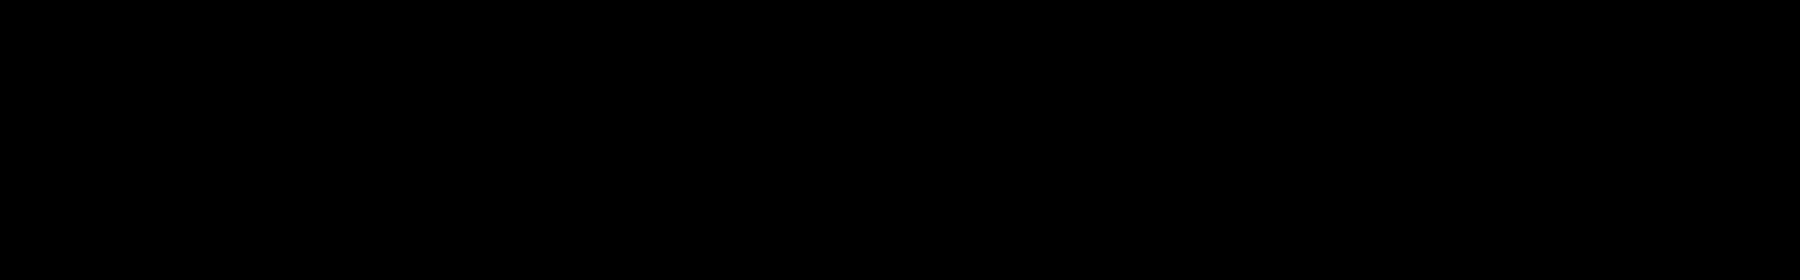 FR3SH BEATZ audio waveform